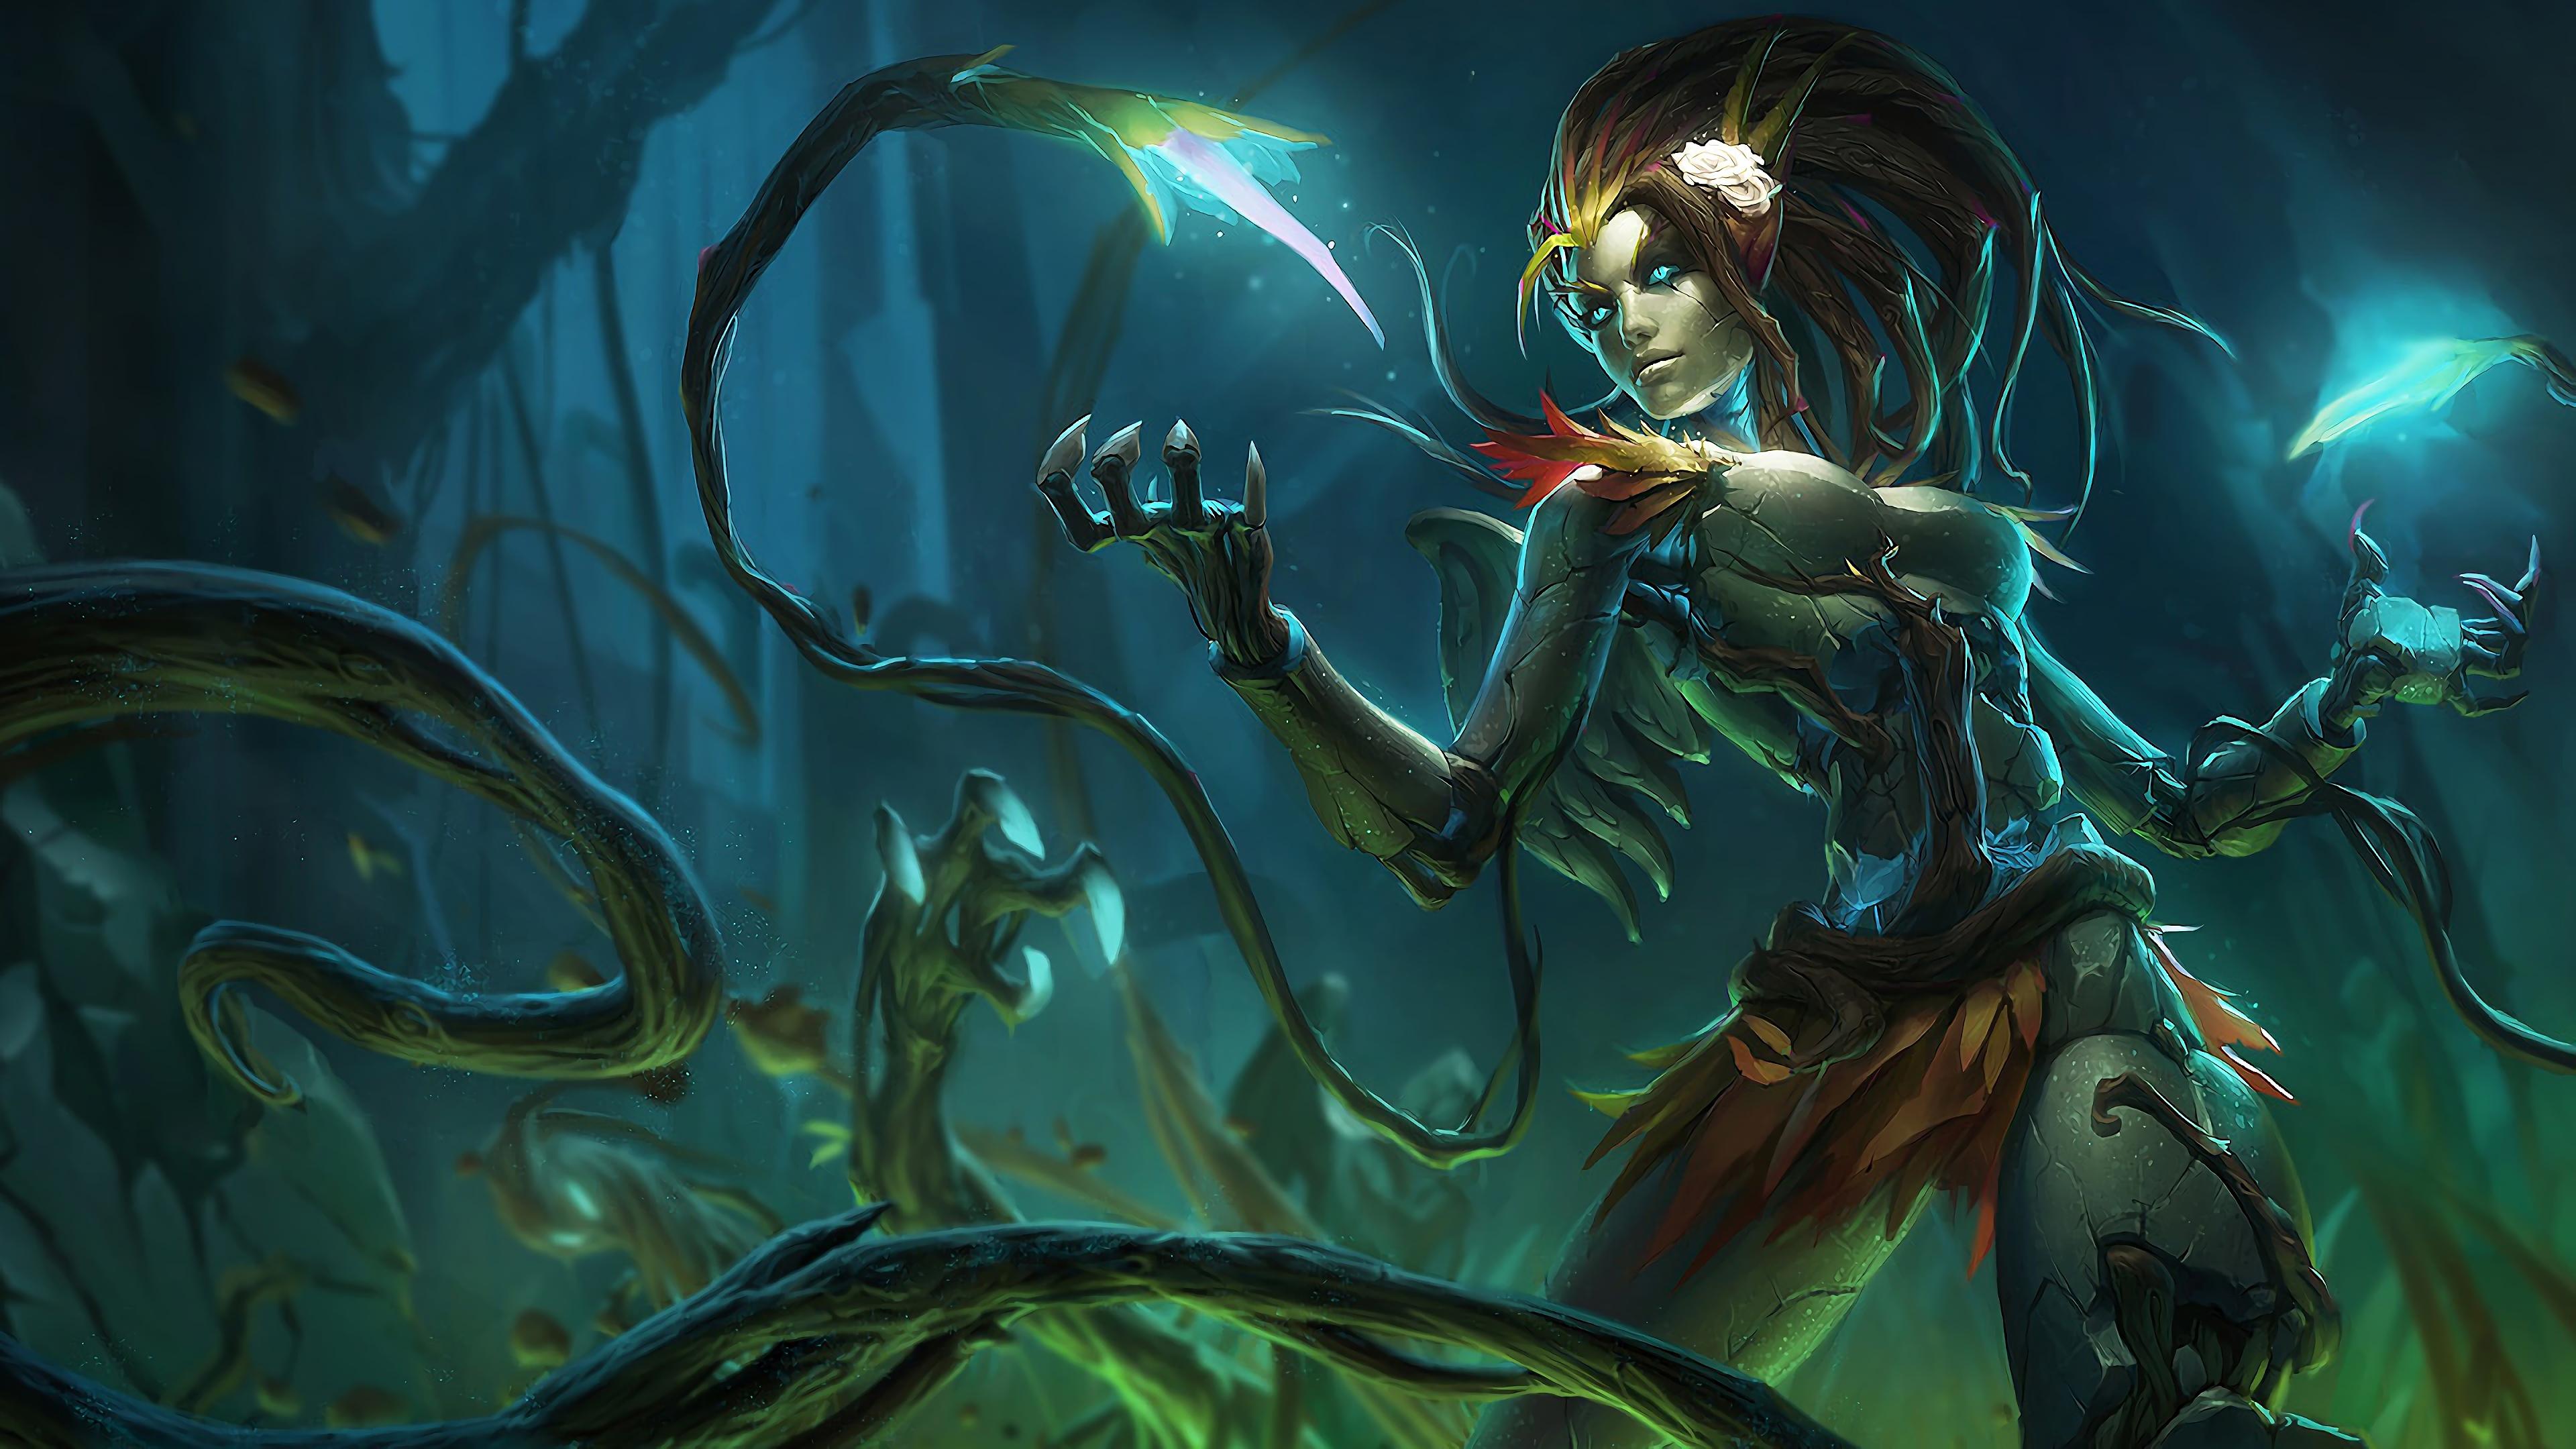 haunted zyra lol splash art league of legends 1574098006 - Haunted Zyra LoL Splash Art League of Legends - Zyra, league of legends